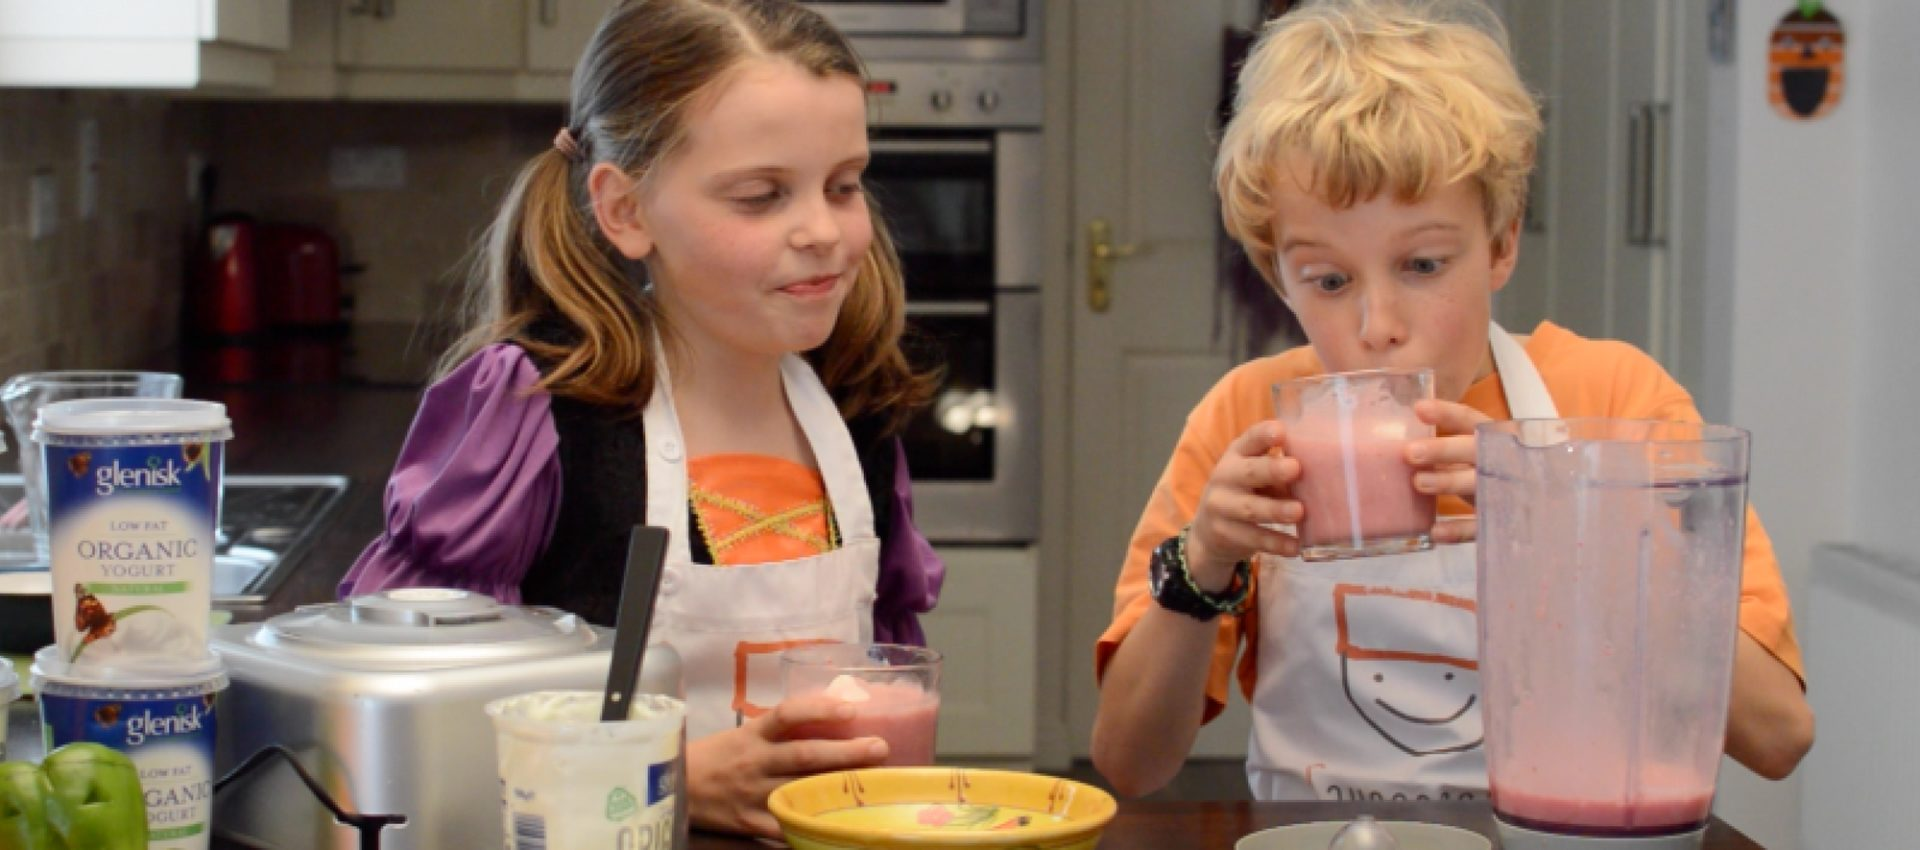 Saucepan Kids make scary fruit smoothies for Halloween with Glenisk Yogurt Ireland